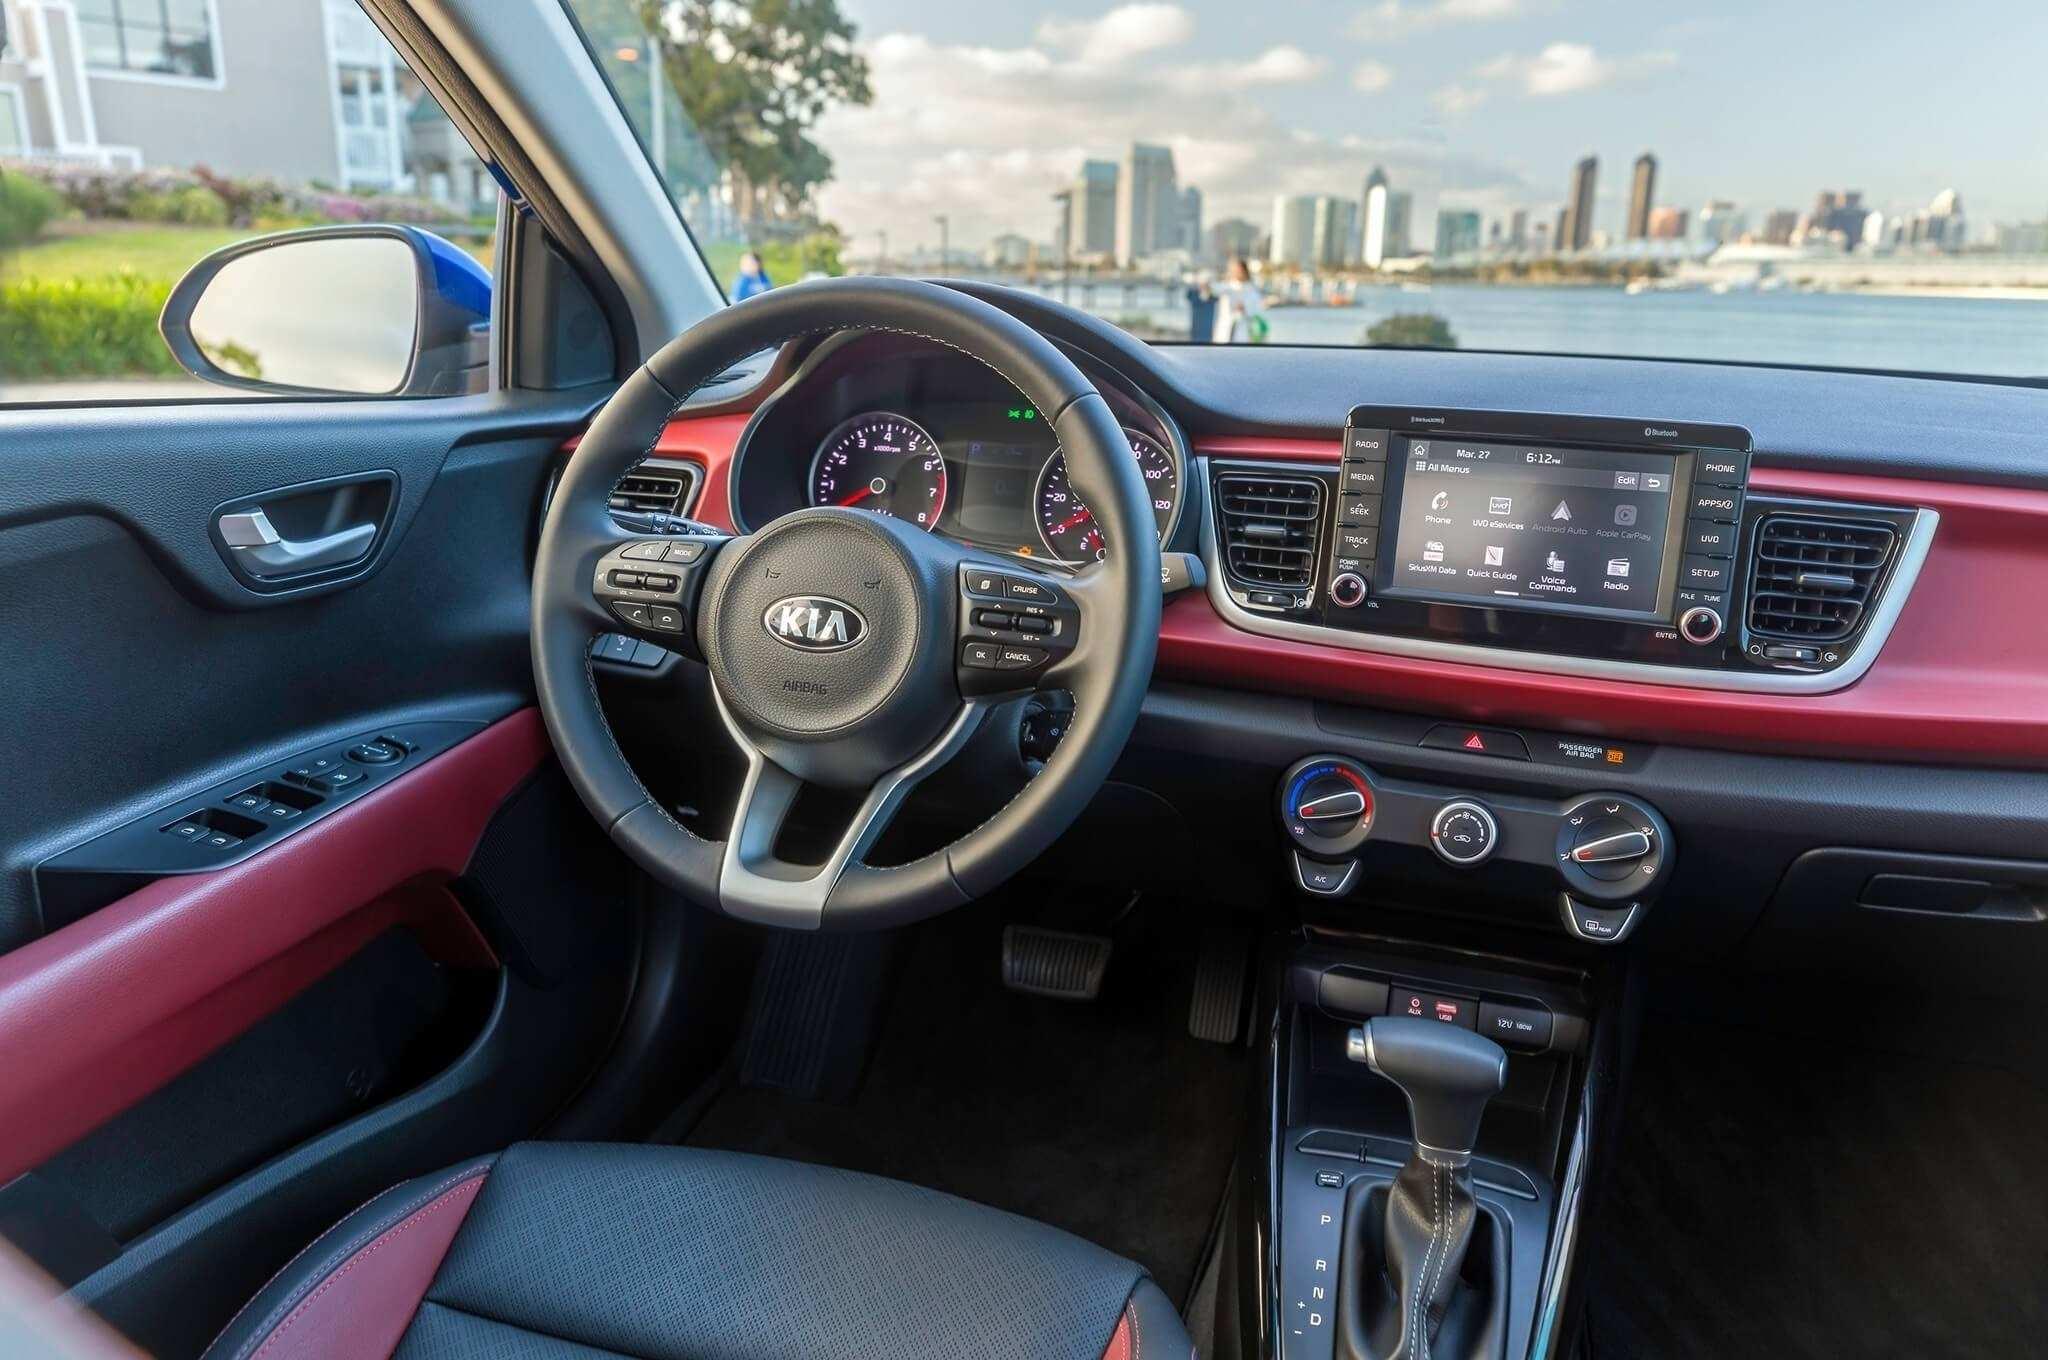 68 Best Review Kia Rio 2020 Overview by Kia Rio 2020